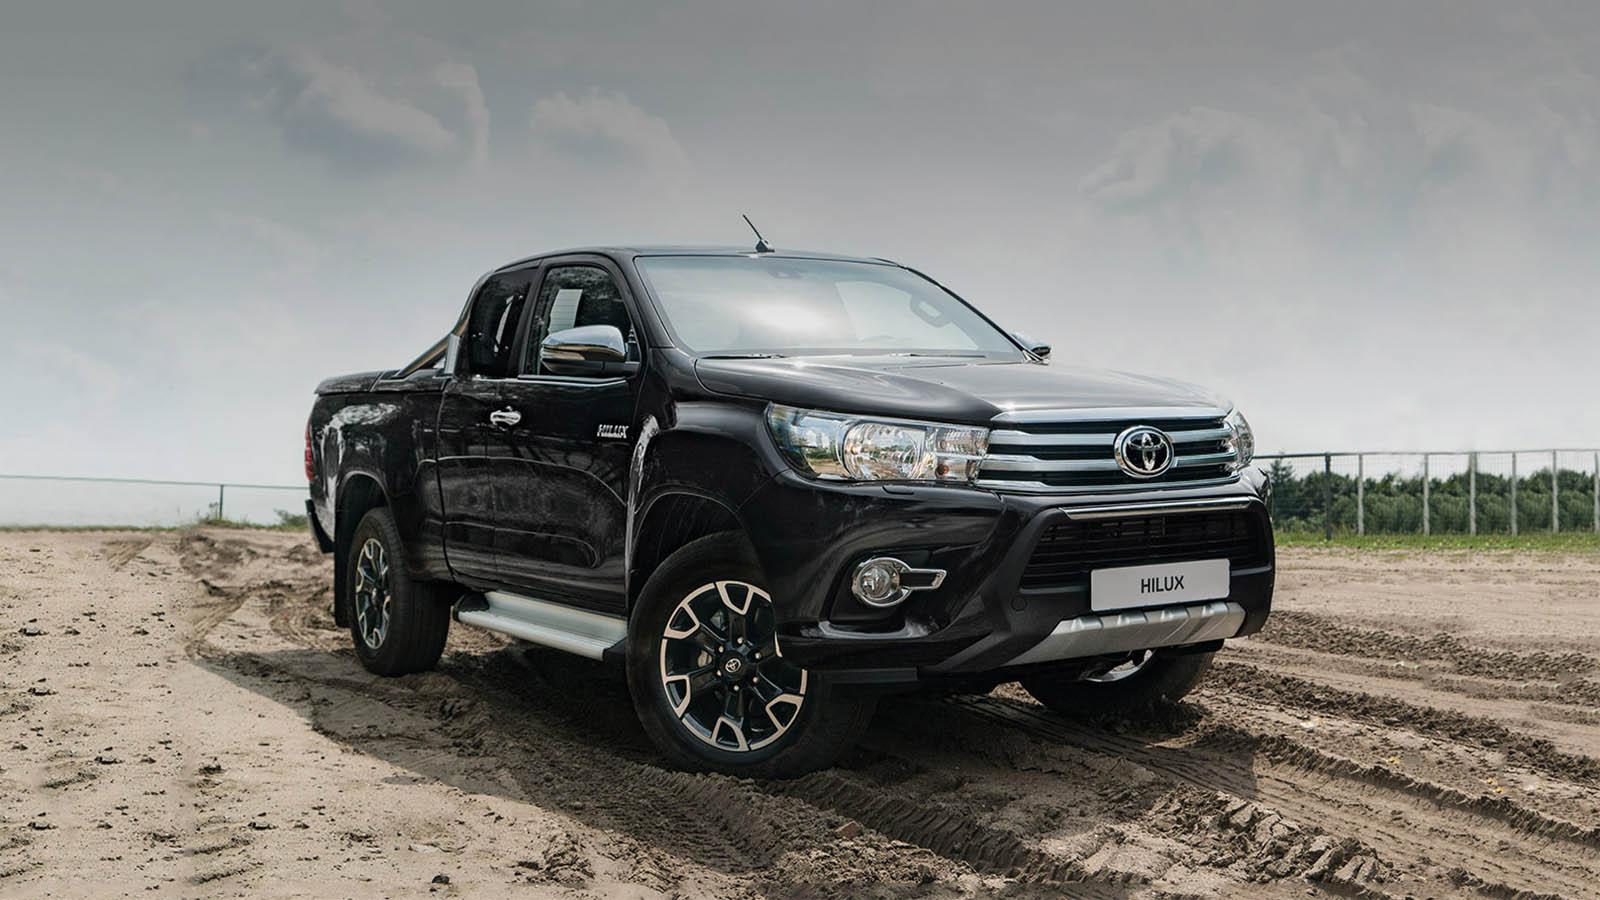 50 jaar toyota nederland Toyota Hilux viert 50 jaar onverwoestbaarheid  Toyota 50 jaar toyota nederland